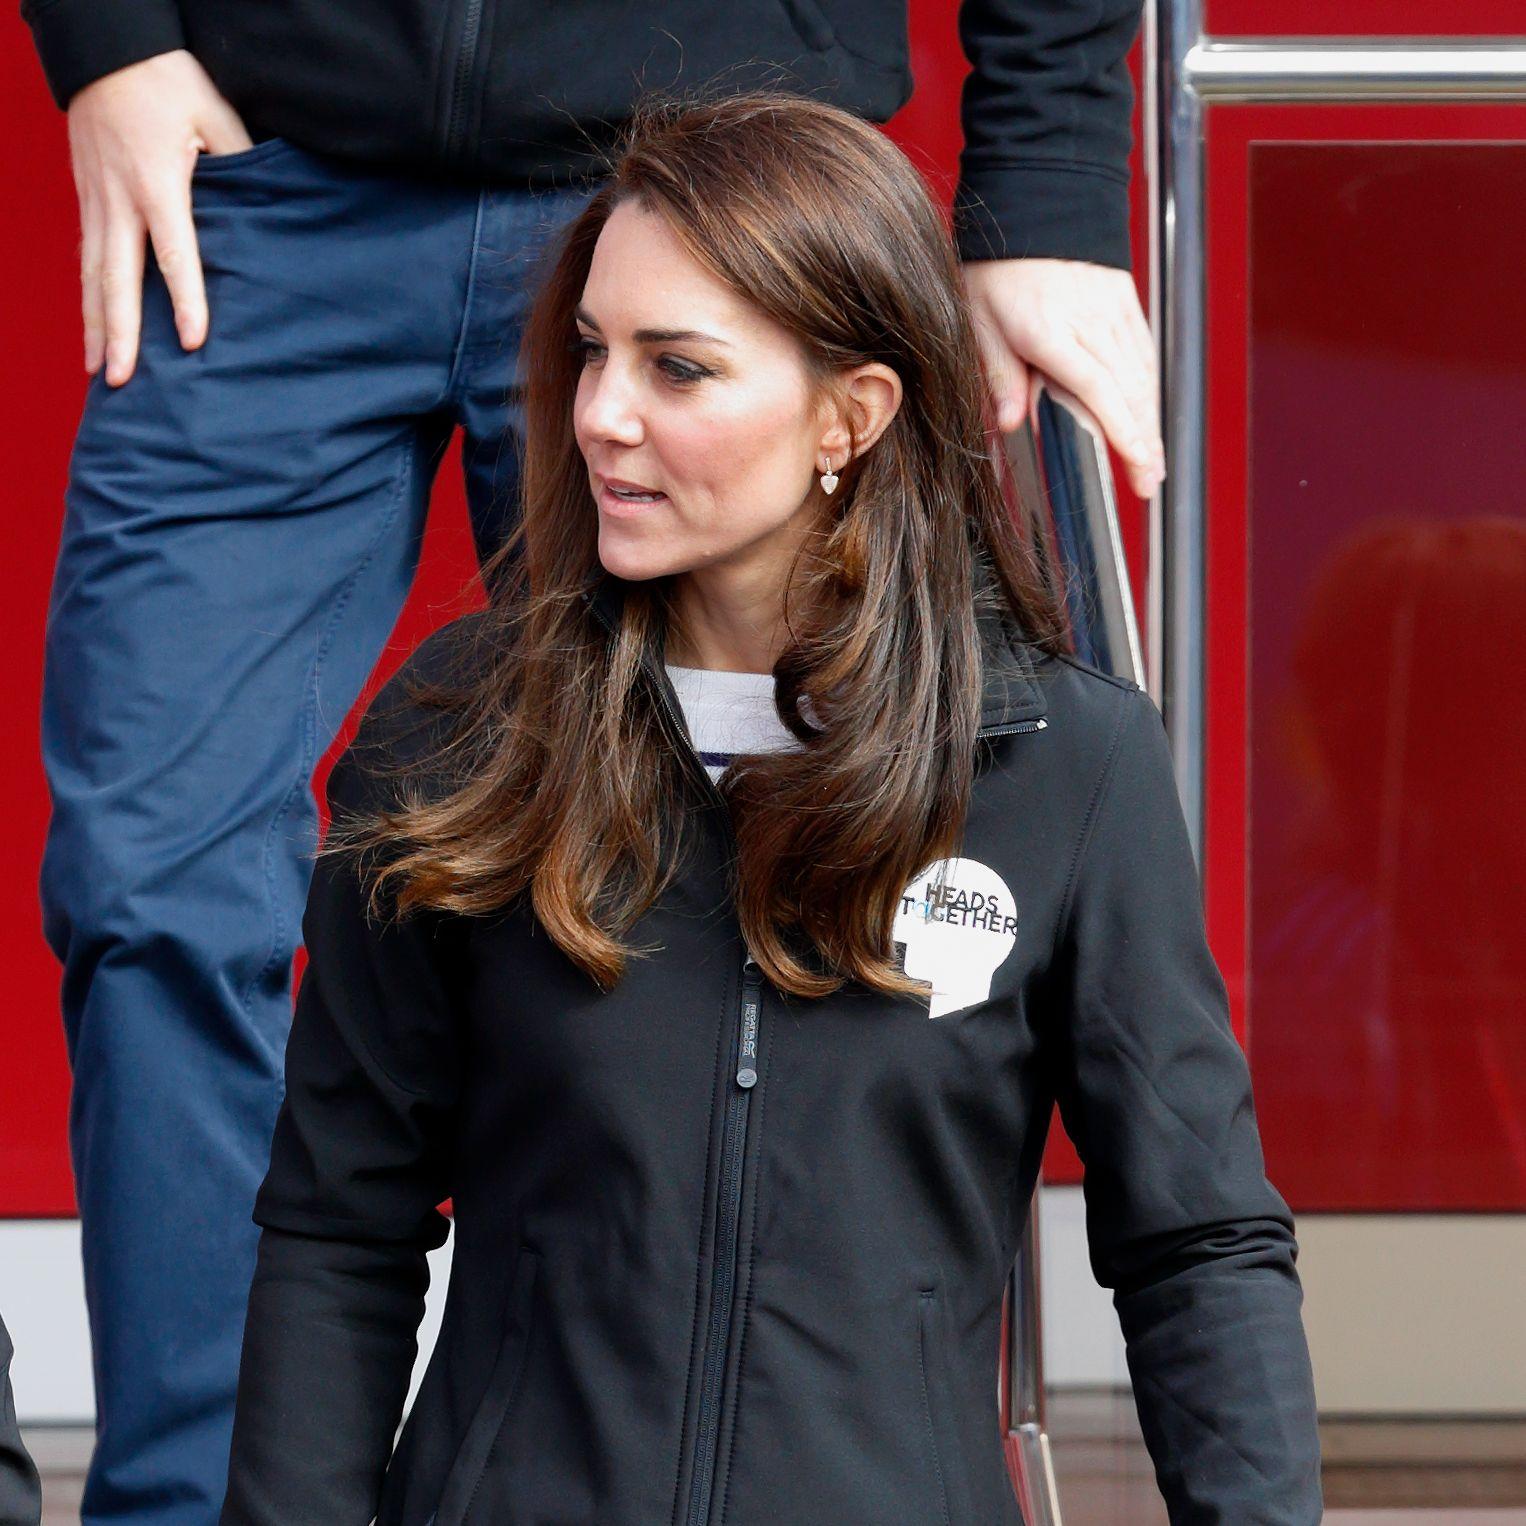 duchess of cambridge heads together marathon